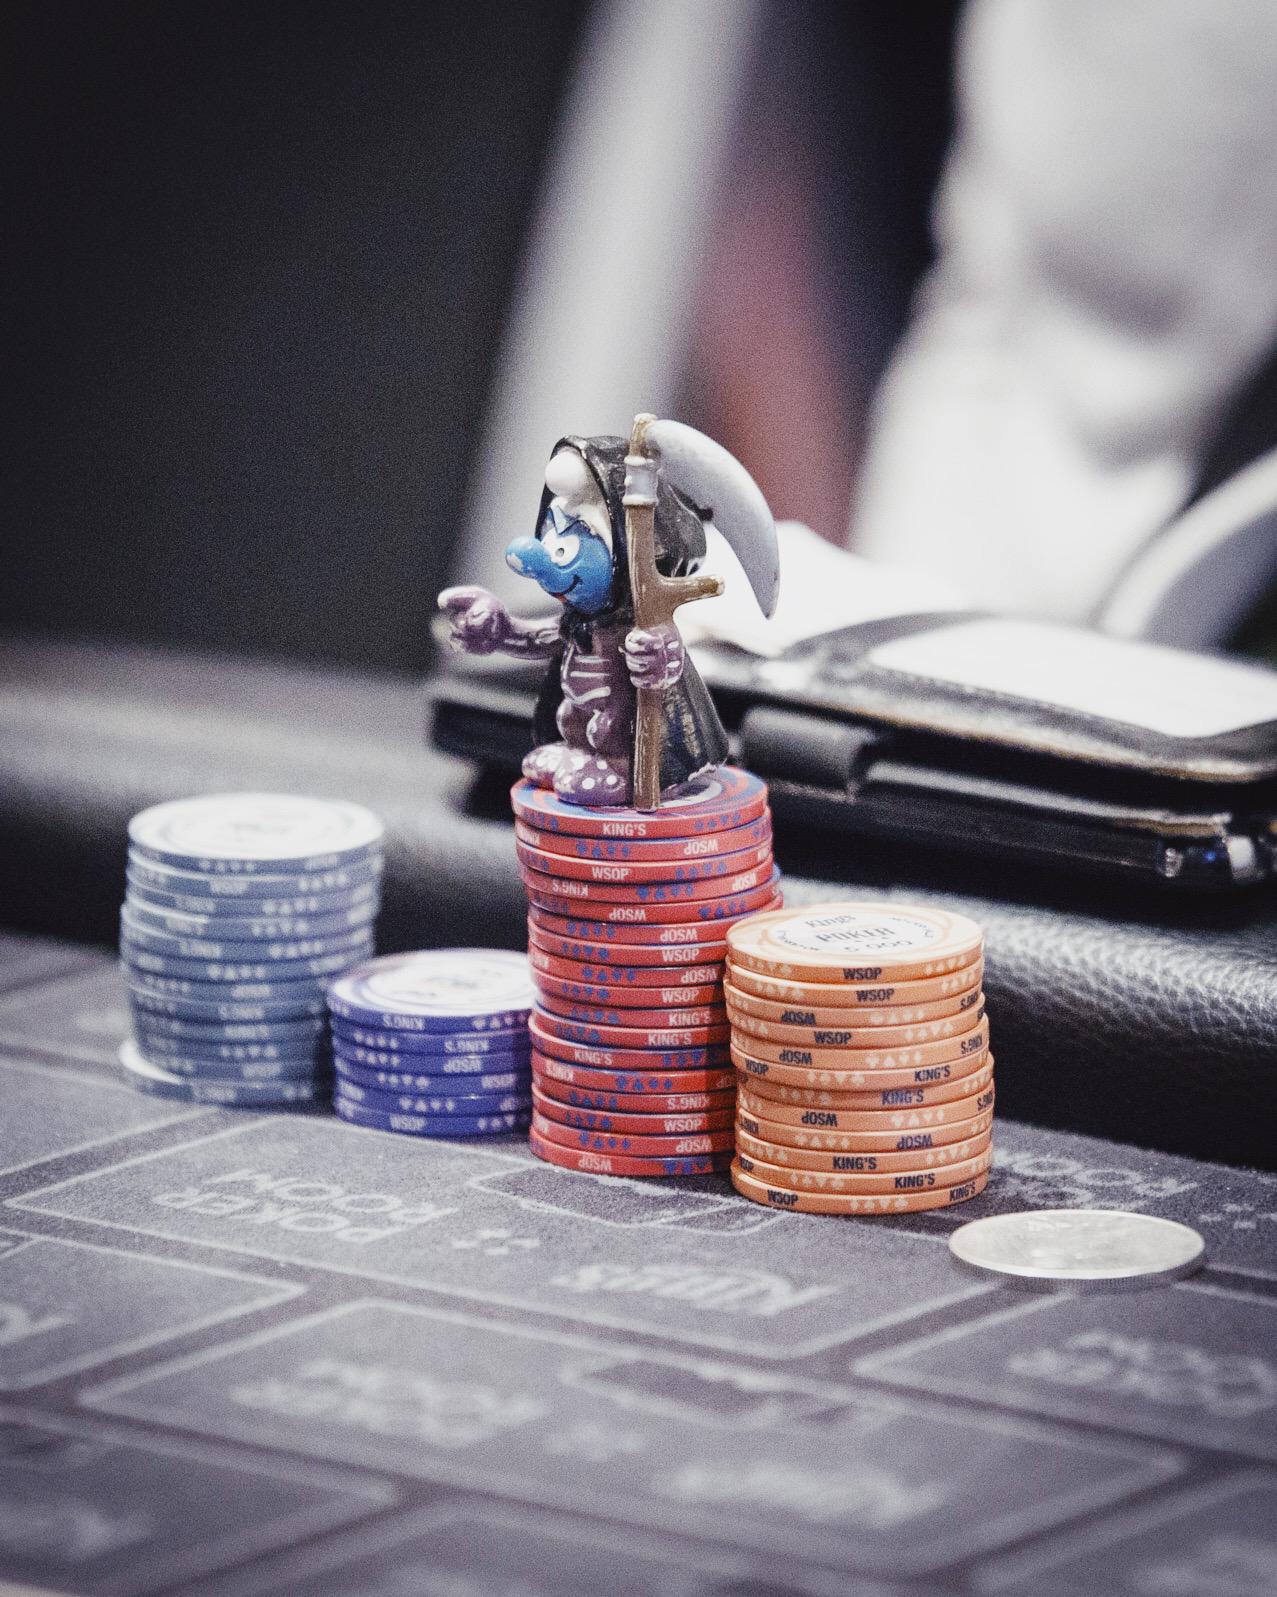 polina-shubkina-poker-031.JPG